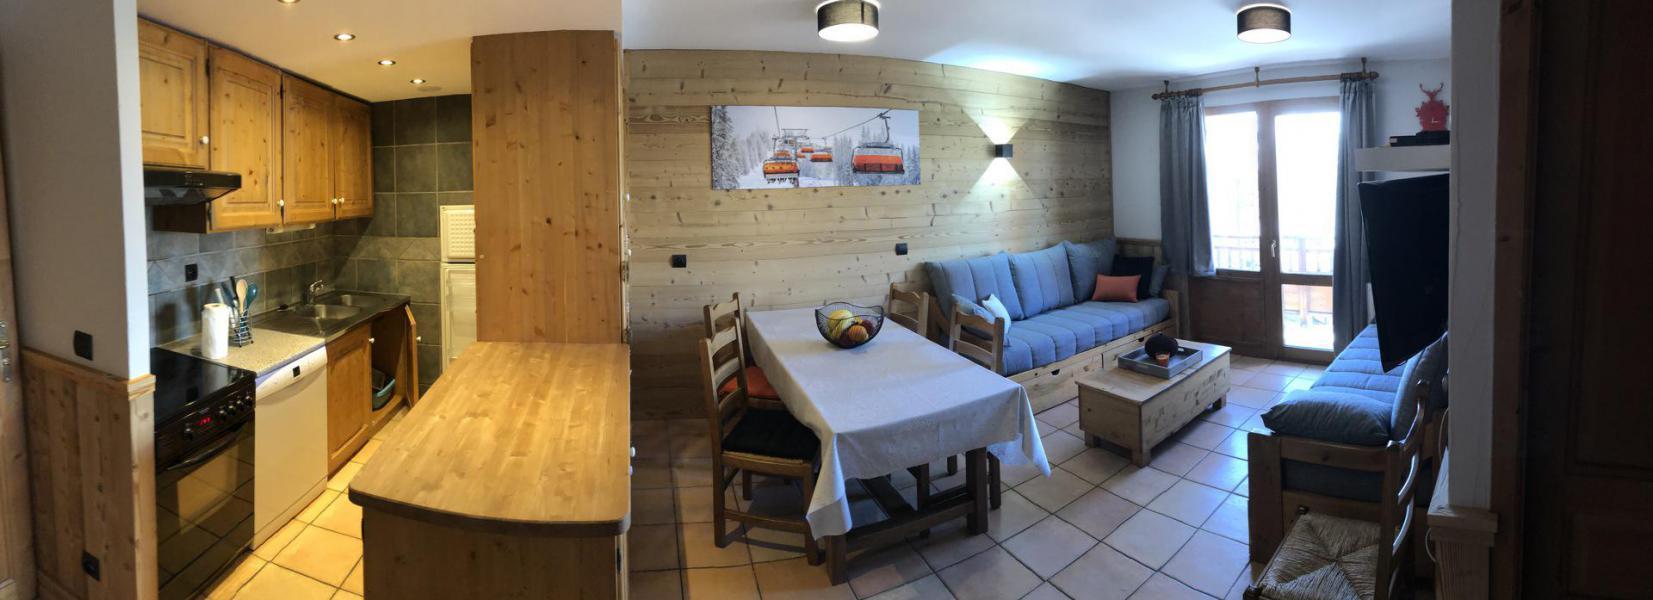 Skiverleih 3-Zimmer-Appartment für 6 Personen (632) - Les Chalets des Balcons - Val Thorens